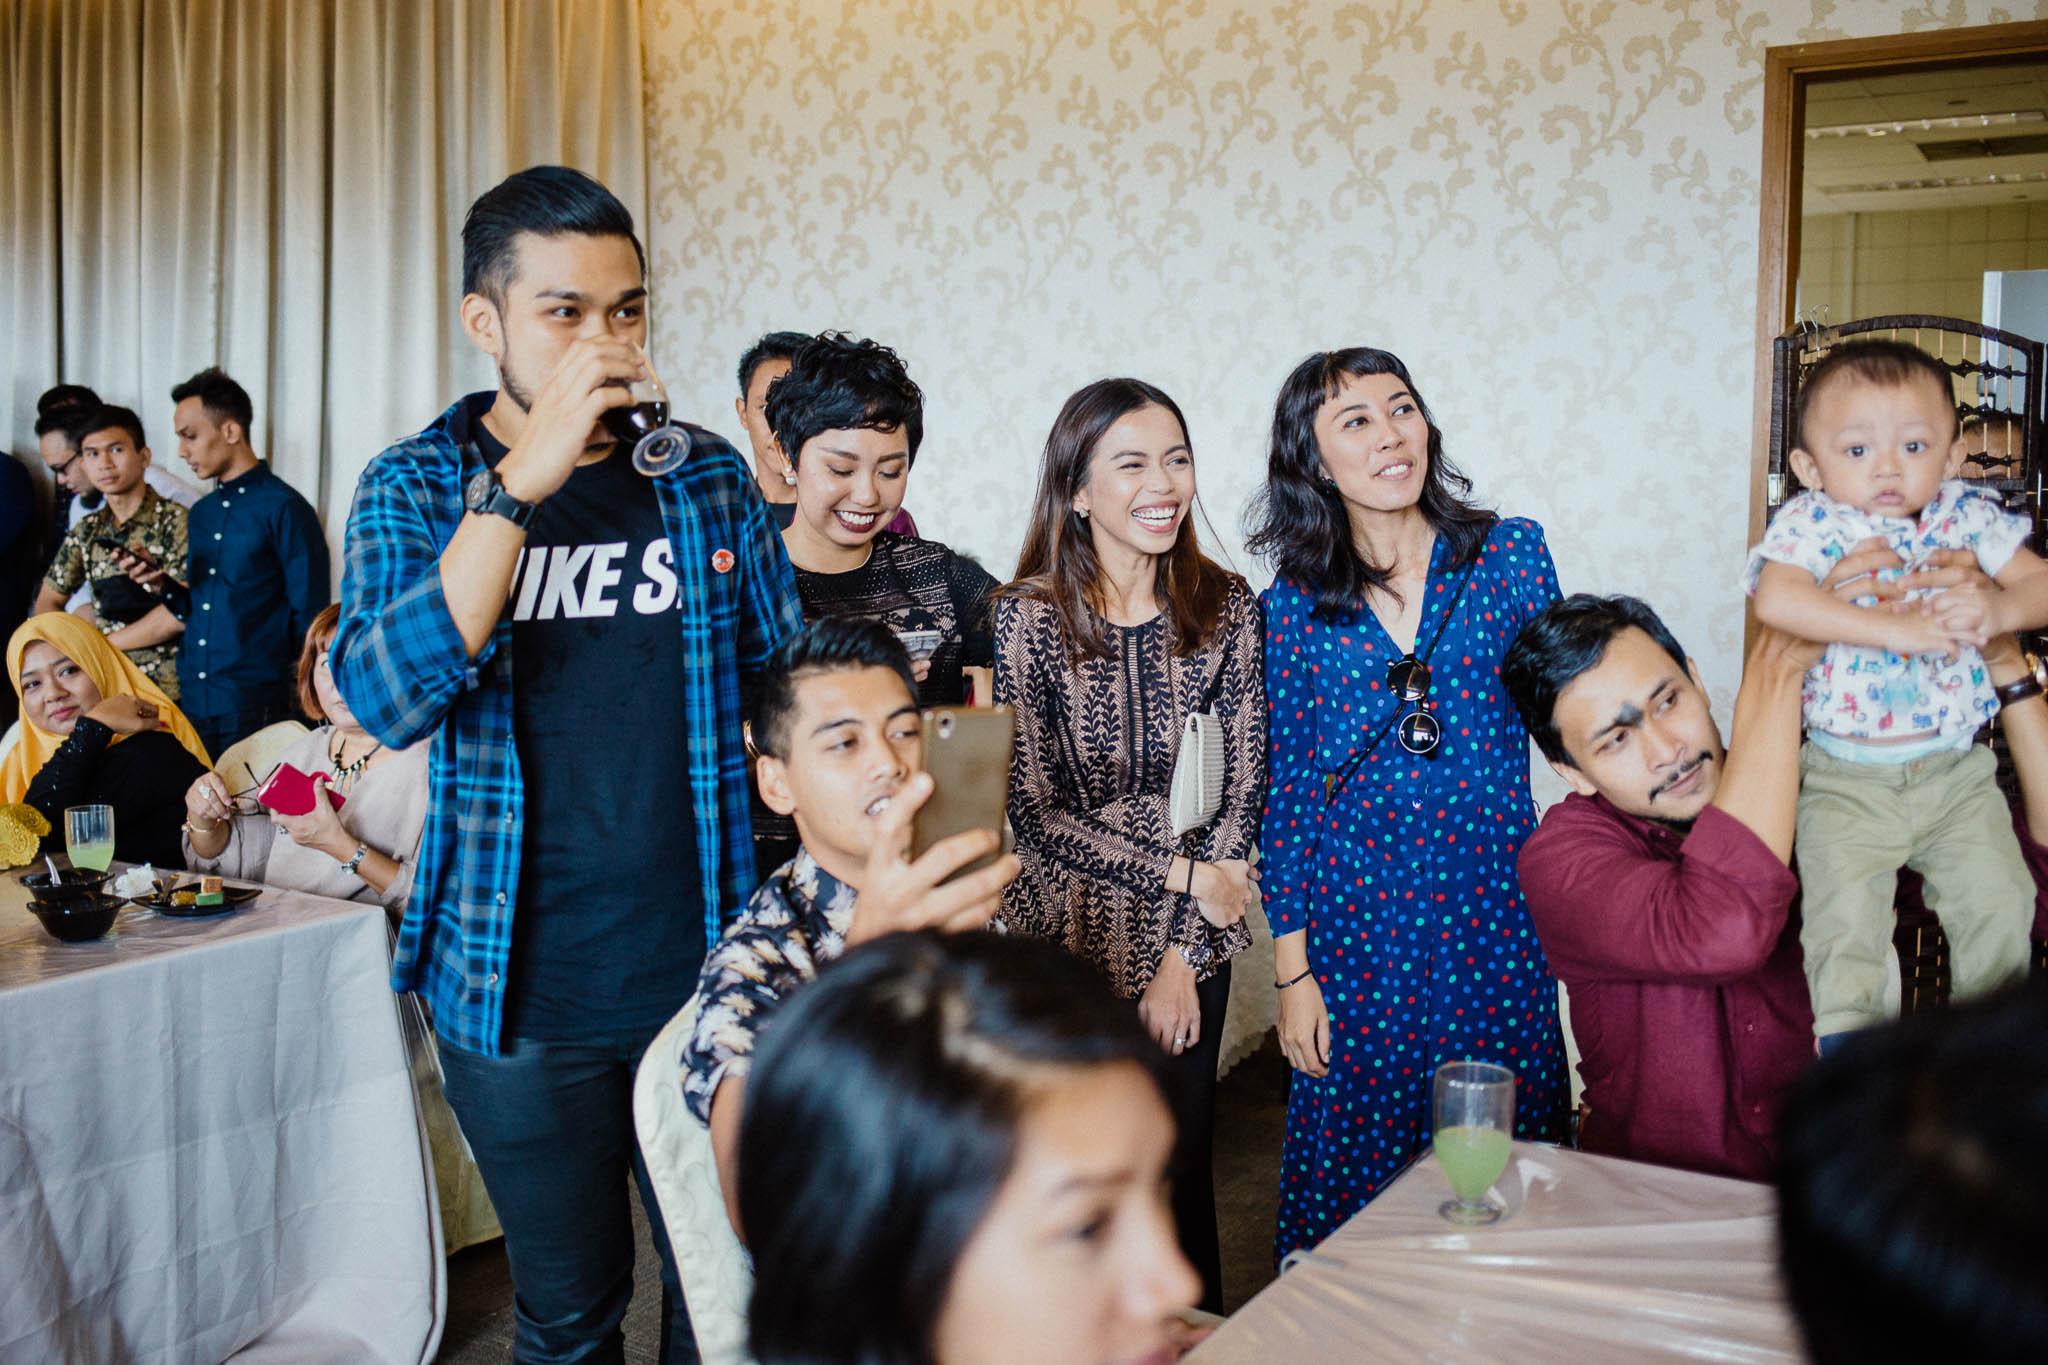 singapore-wedding-photographer-addafiq-nufail-046.jpg